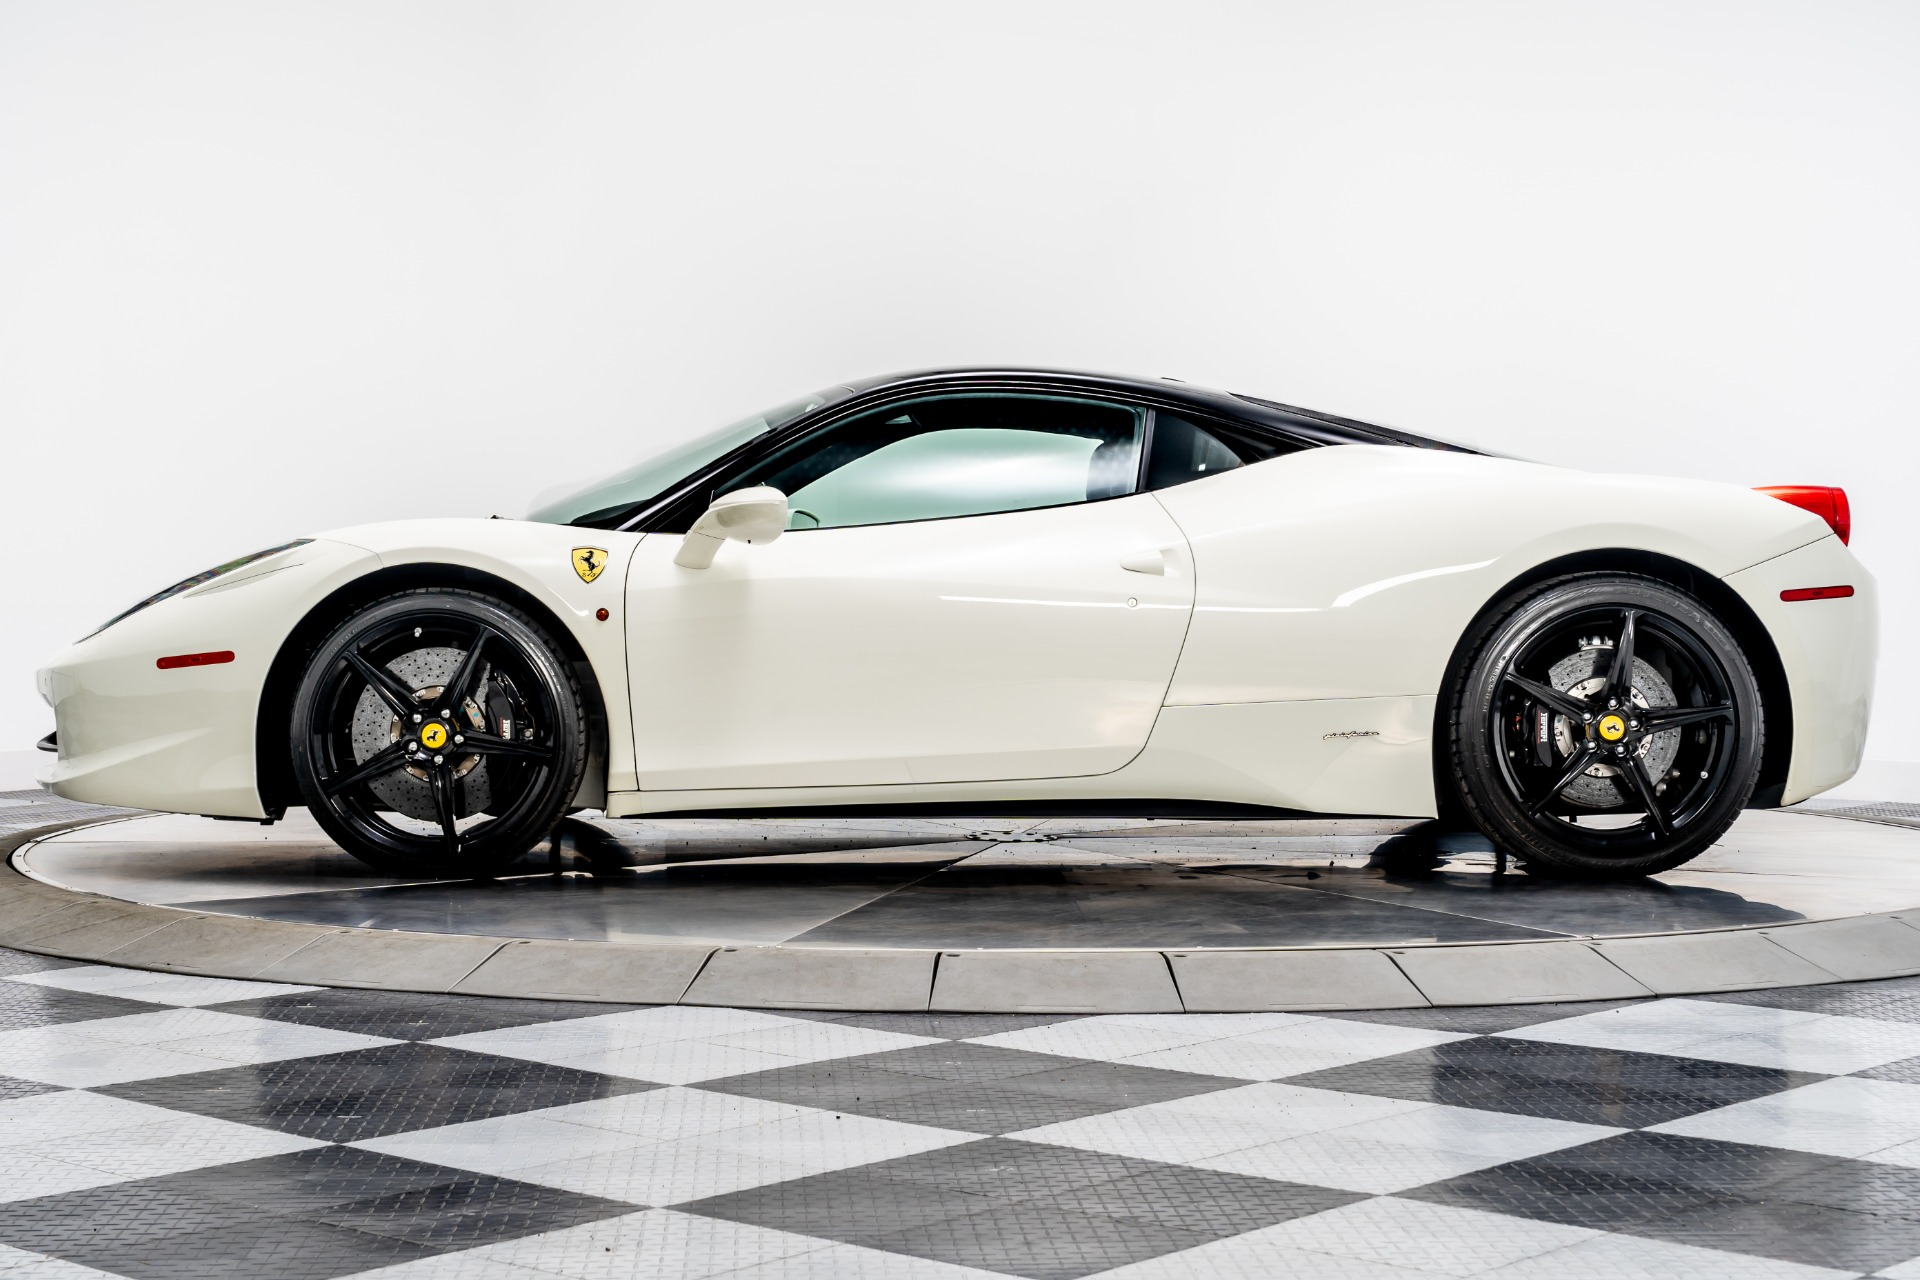 Used 2011 Ferrari 458 Italia For Sale Sold Marshall Goldman Beverly Hills Stock W20909